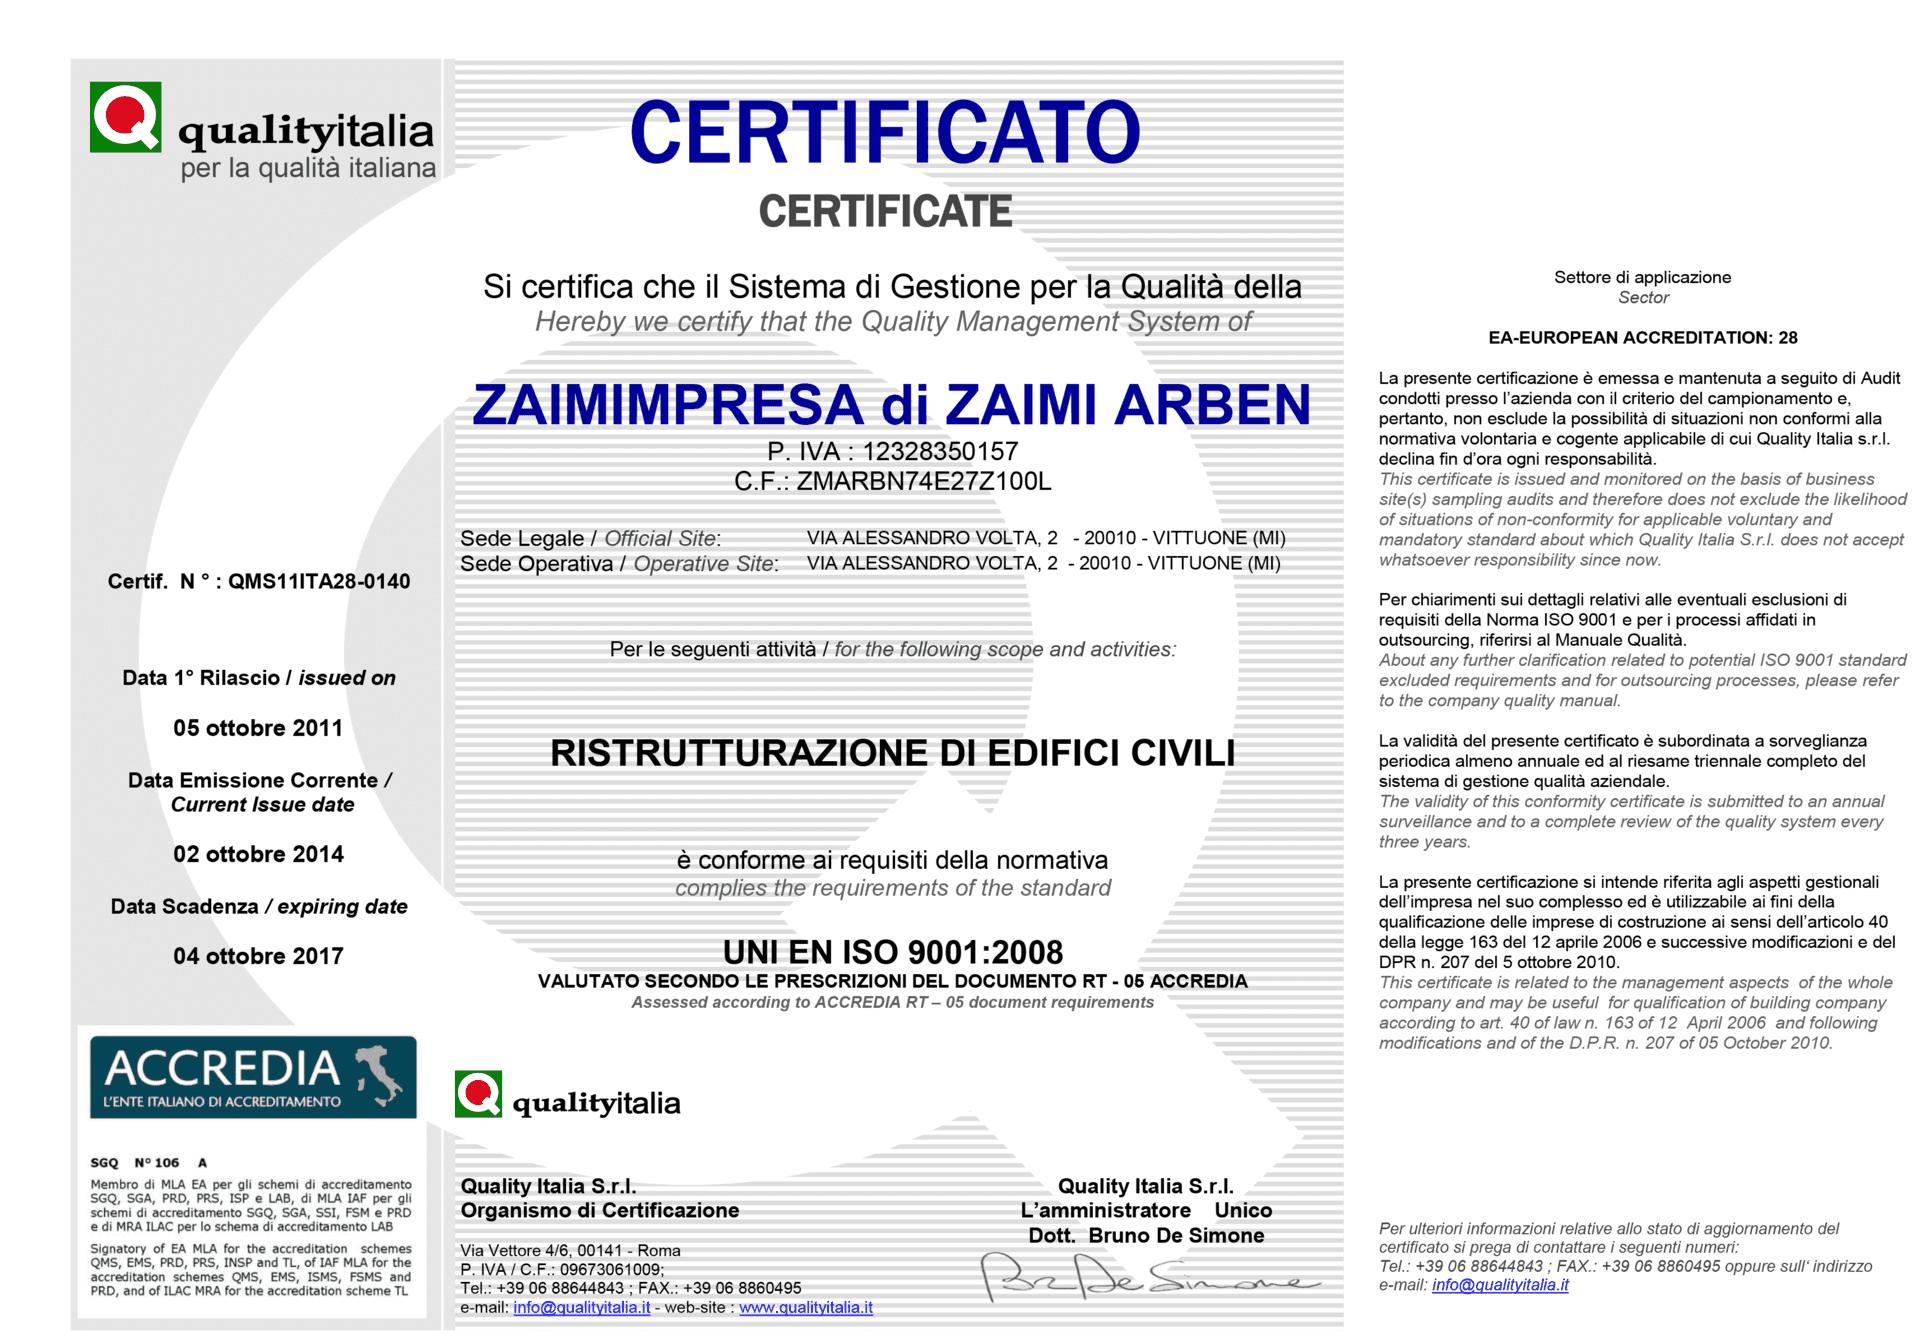 Certificato Zaimimpresa di Zaimi Arben